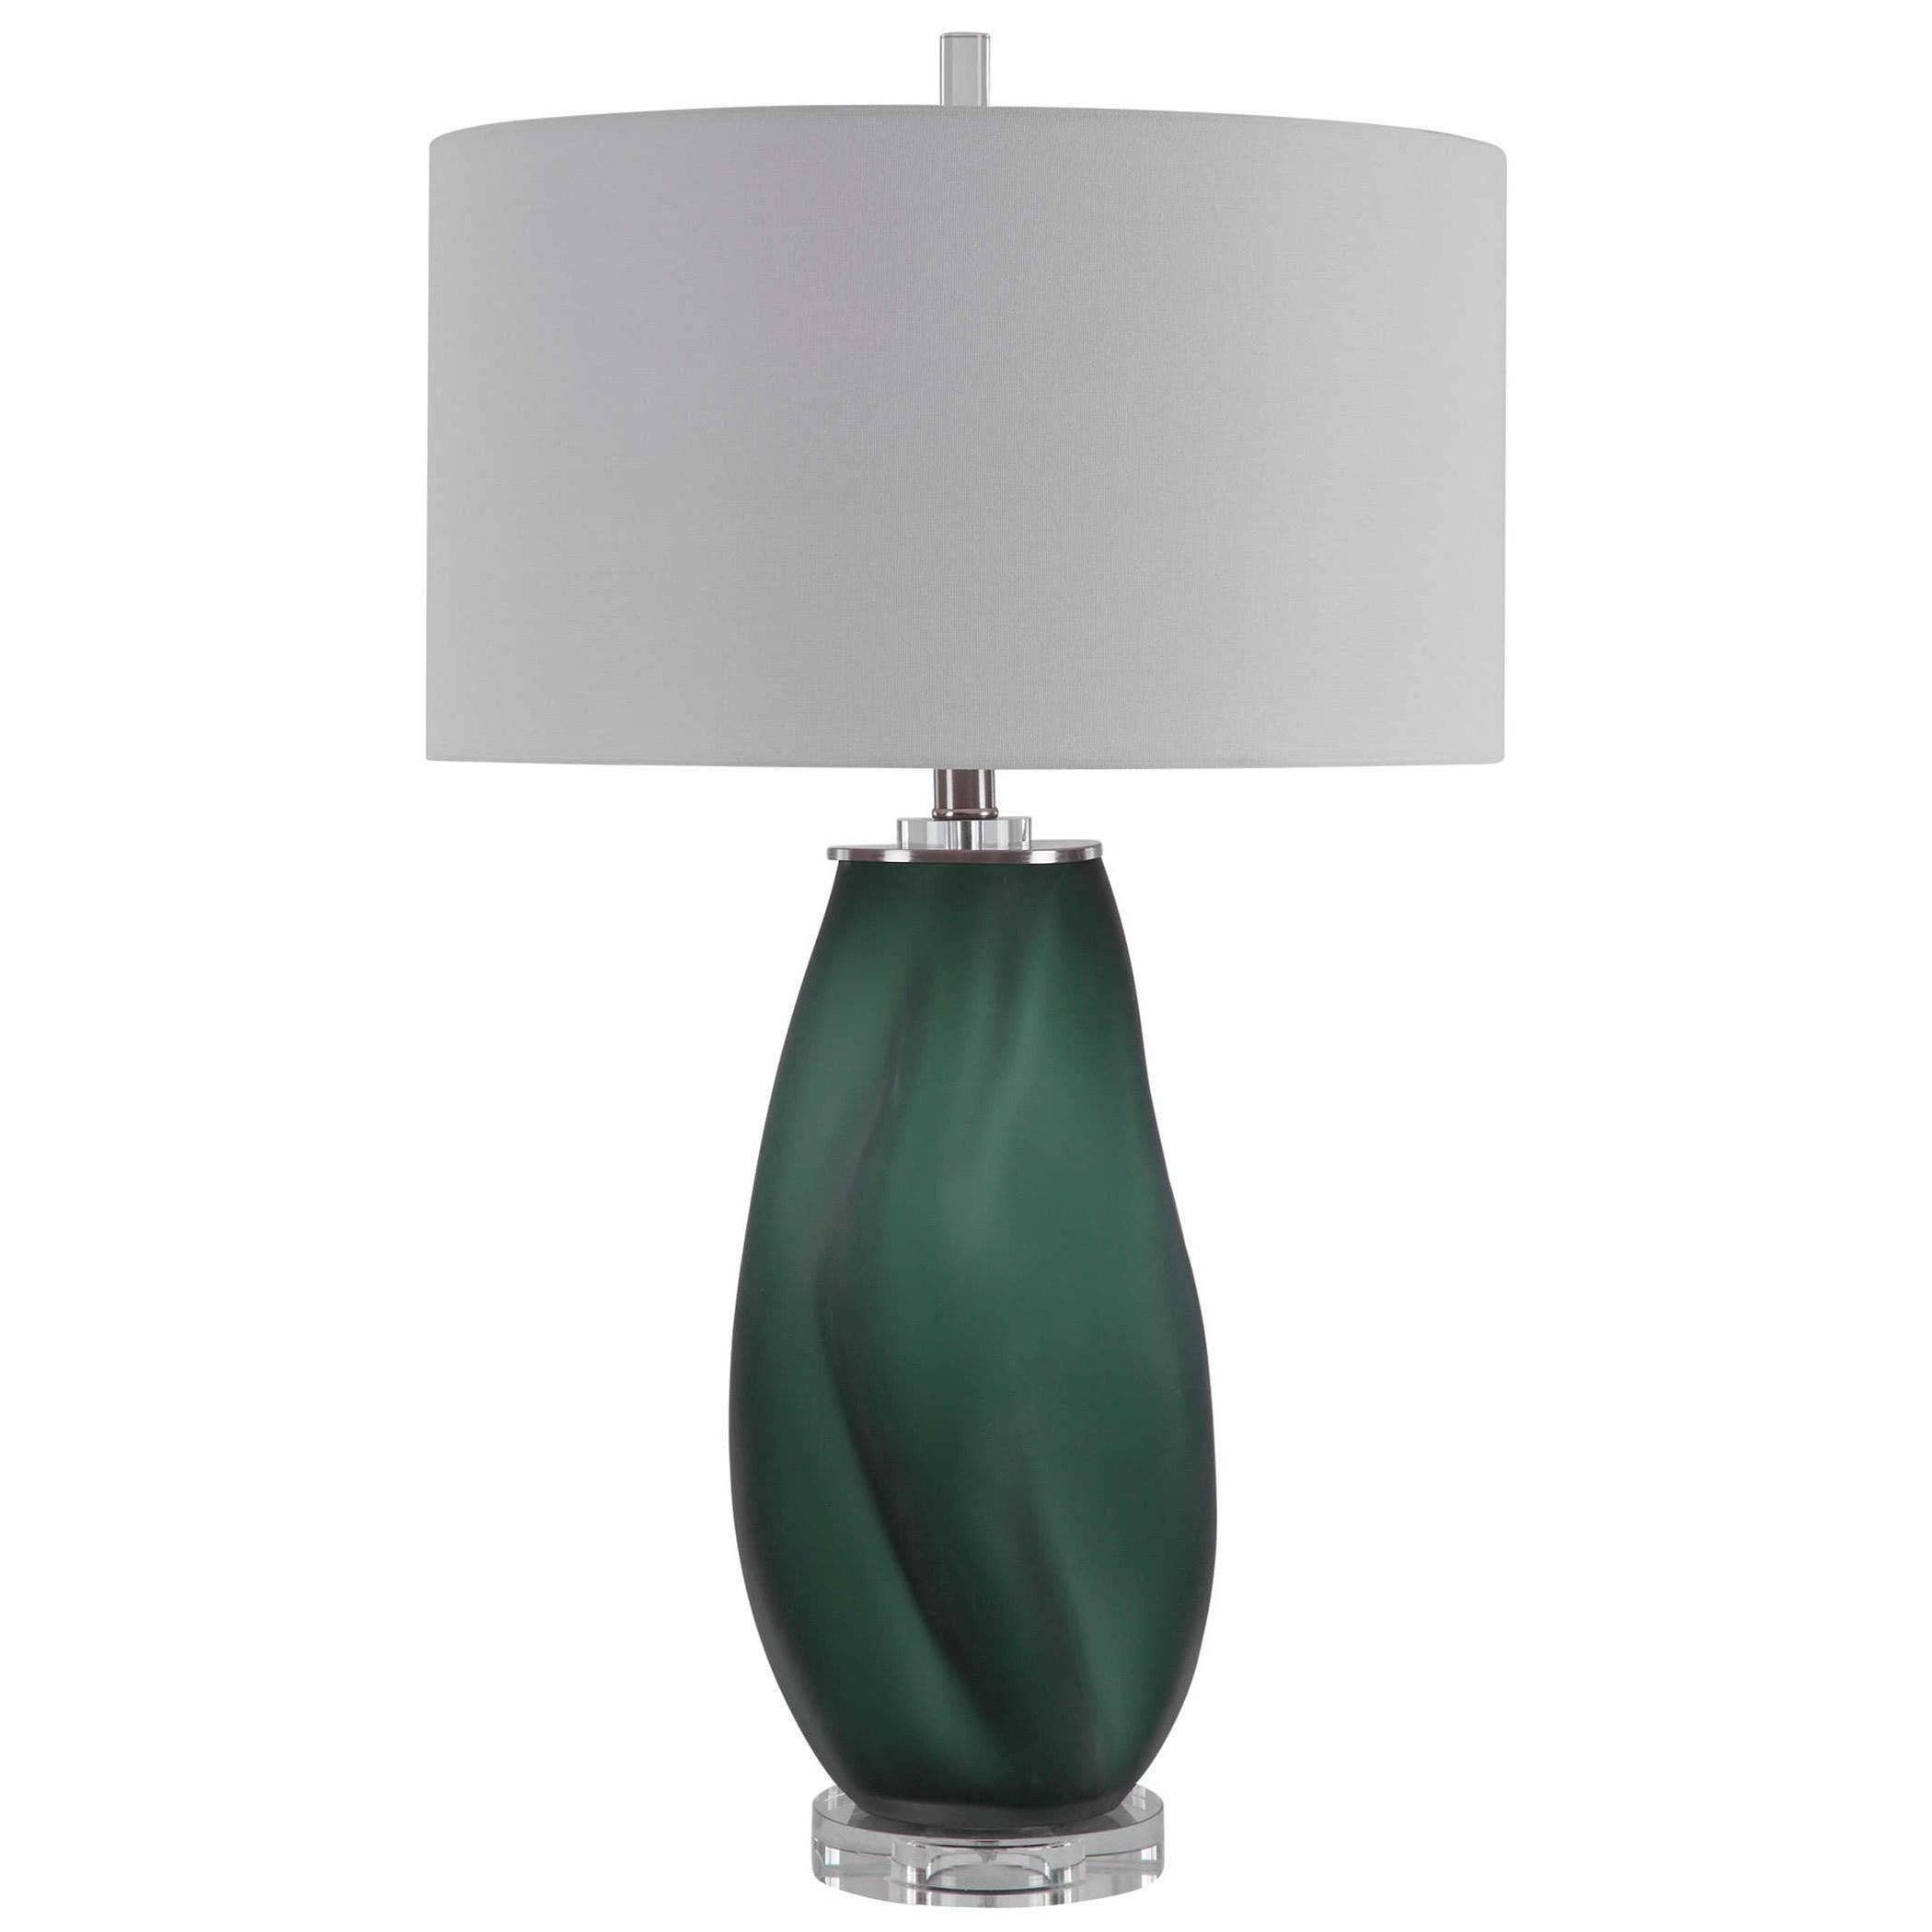 Esmeralda Green Glass Table Lamp